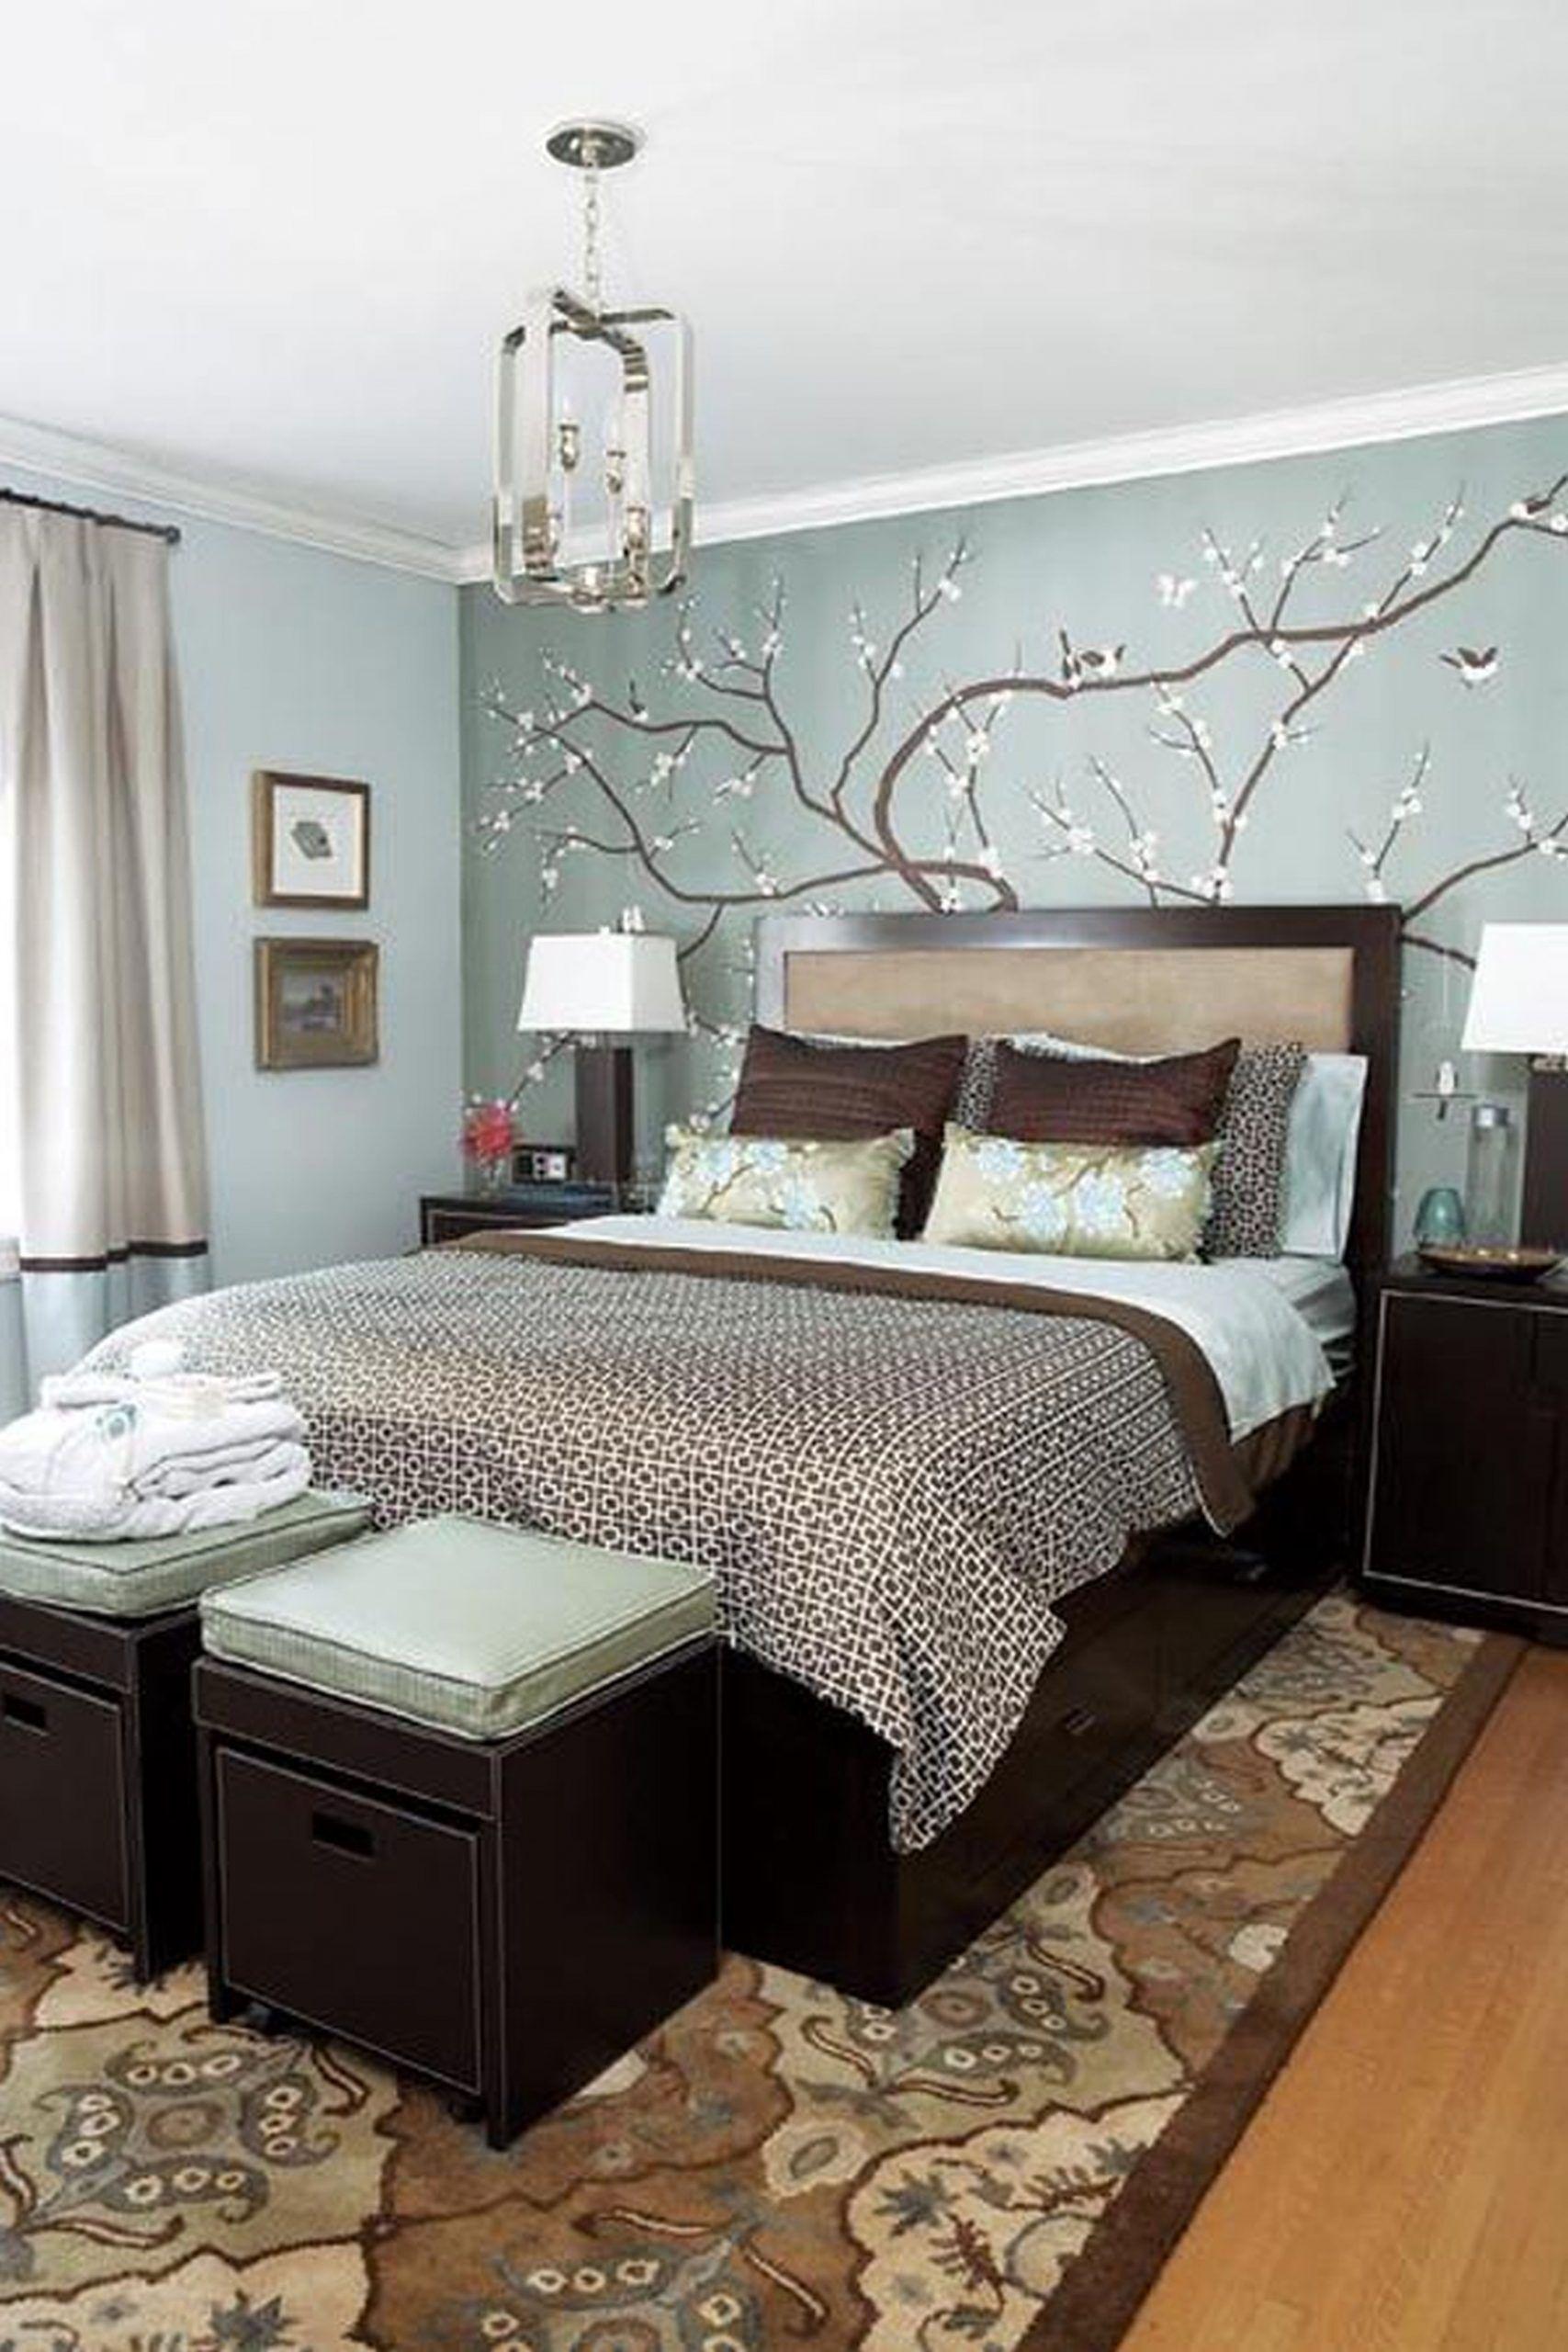 Cherry Wood Bedroom Decorating Ideas Bedroom Decorating Ideas With Grey Walls In 2020 Master Bedrooms Decor Small Master Bedroom Blue Master Bedroom